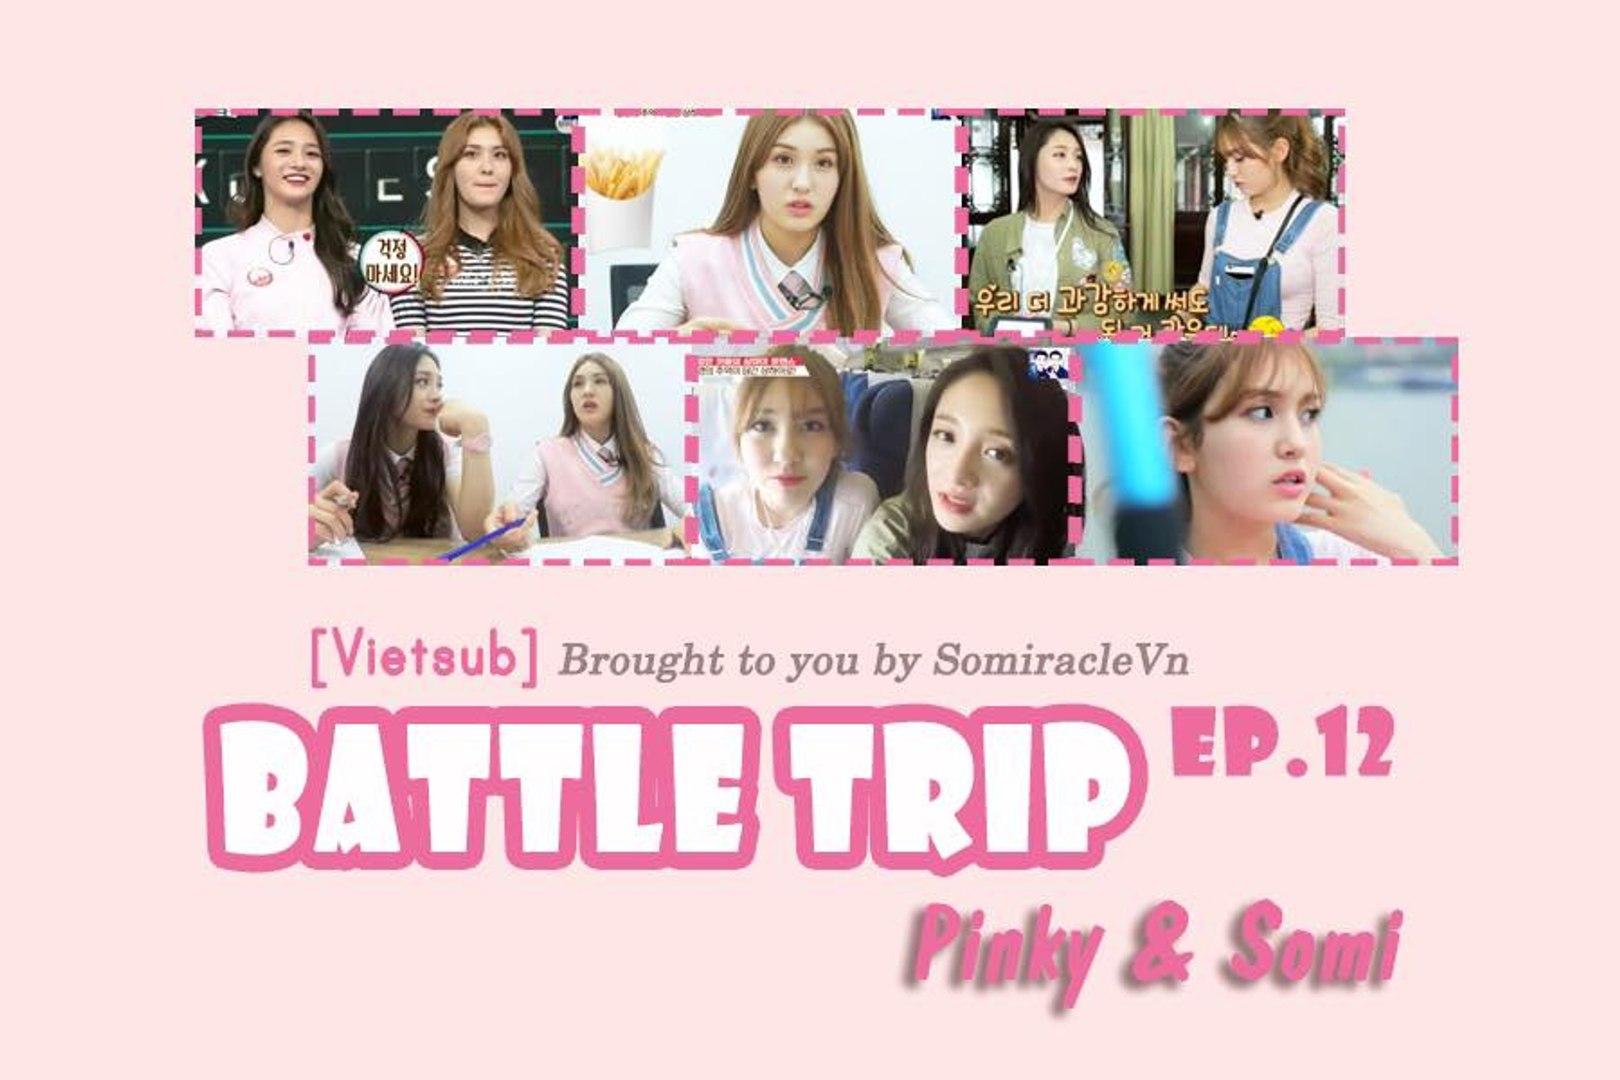 [Vietsub] Battle Trip - Ep.12 Part 4/4 Pinky & Somi